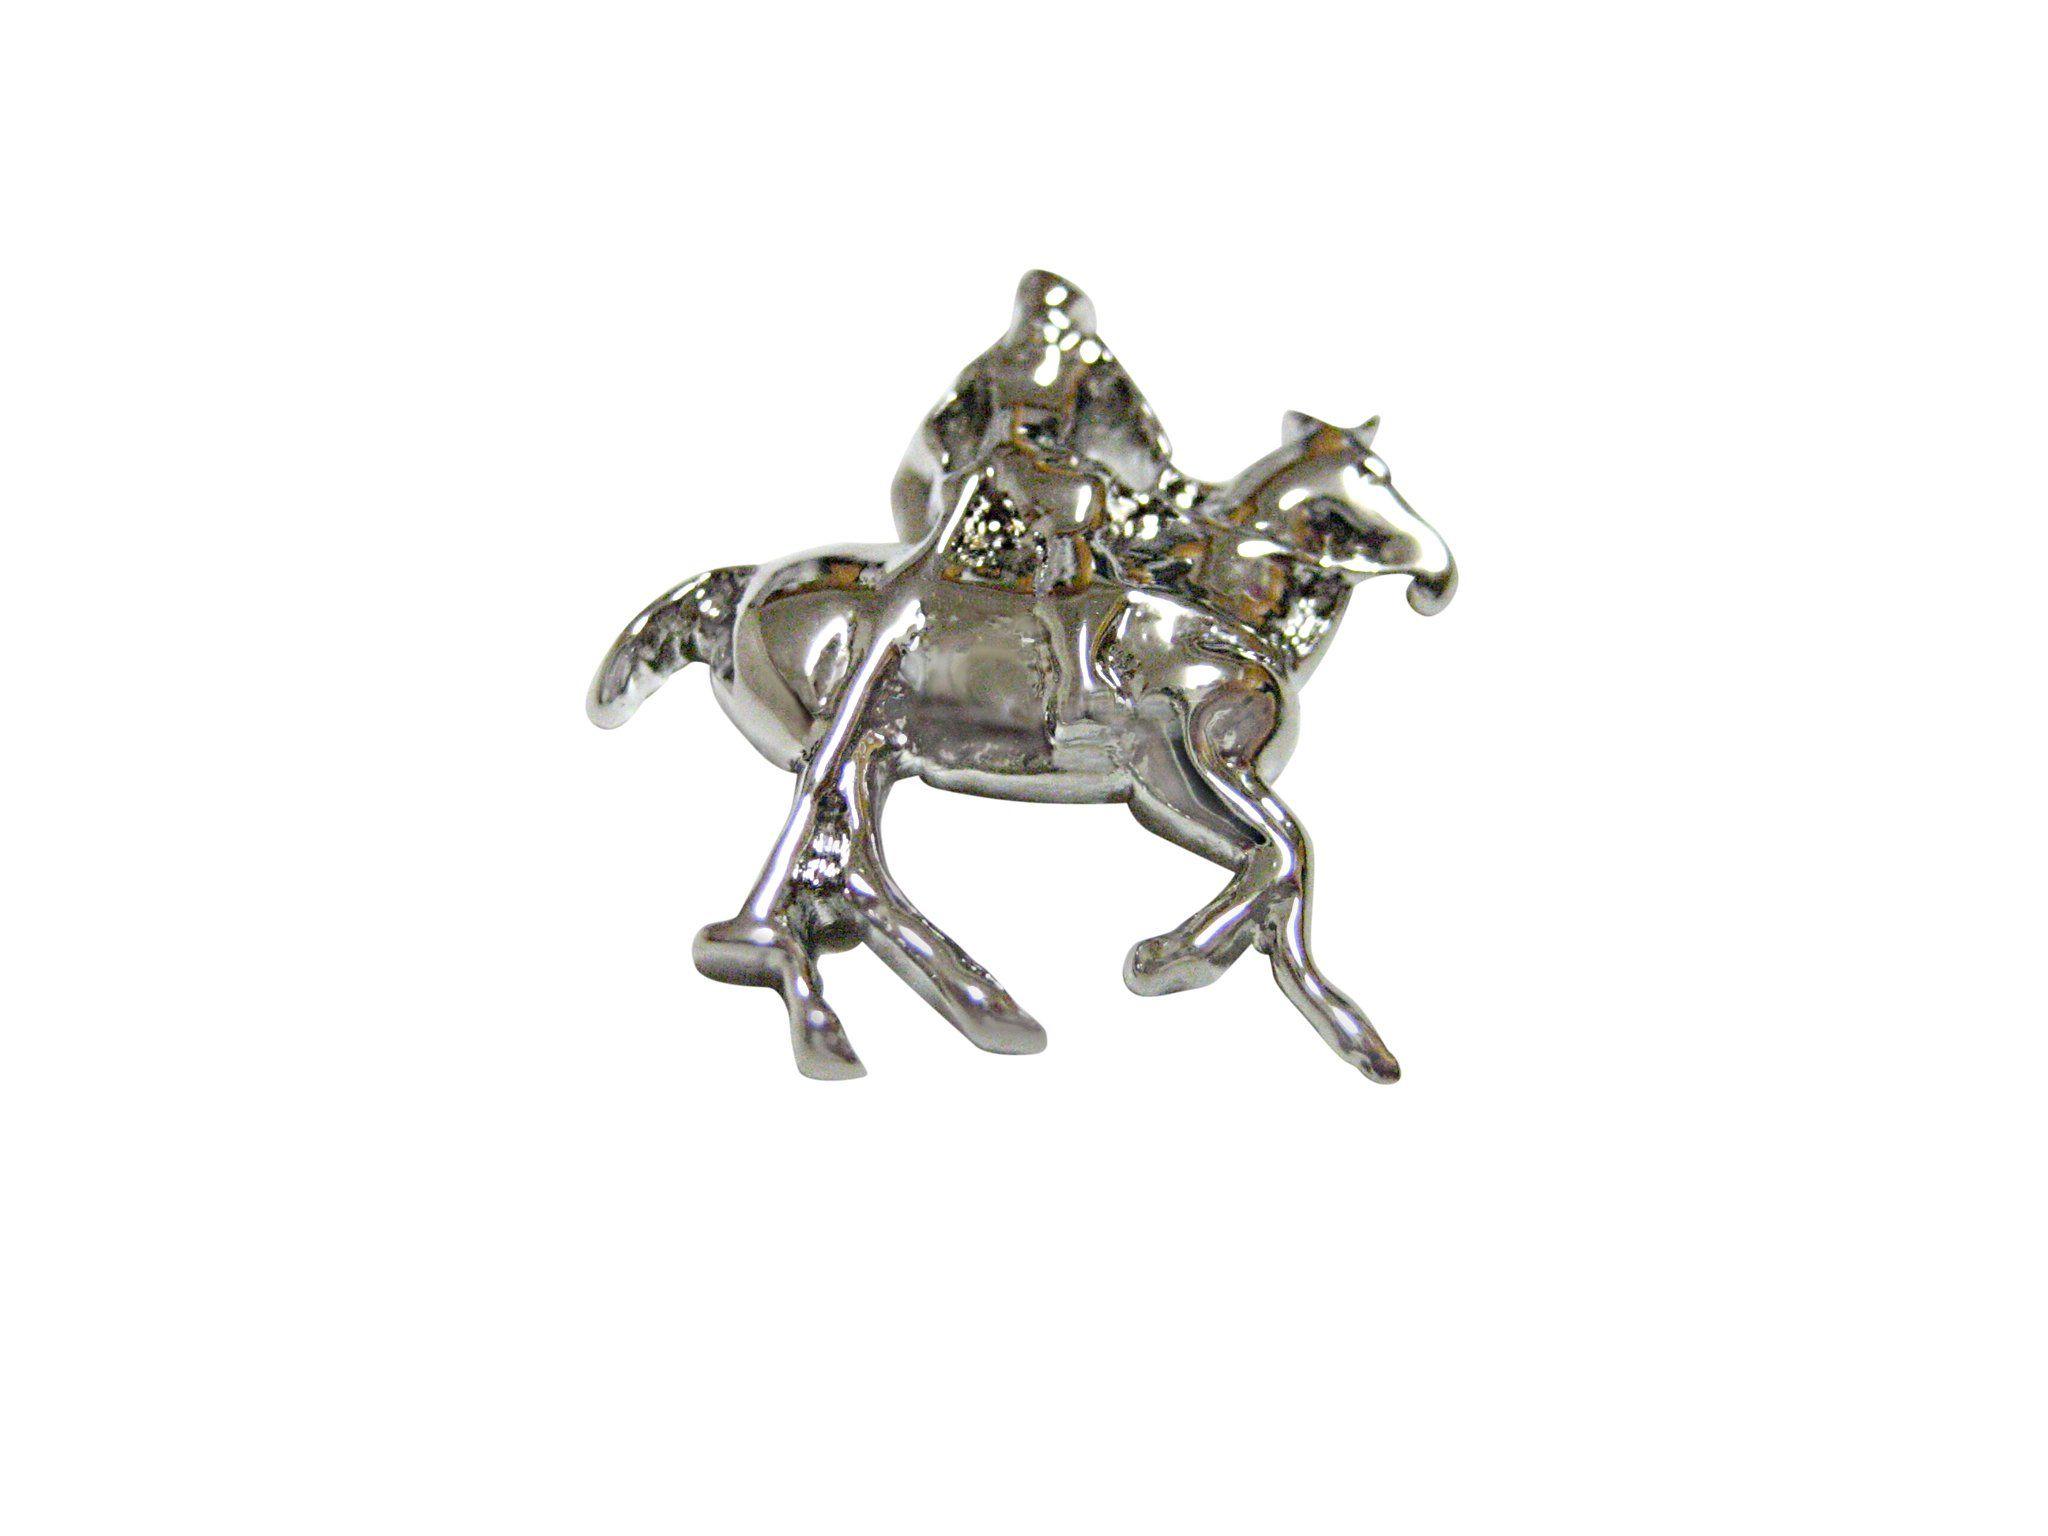 Horse Riding Polo Player Magnet Pendants Horse Riding Metallic Object